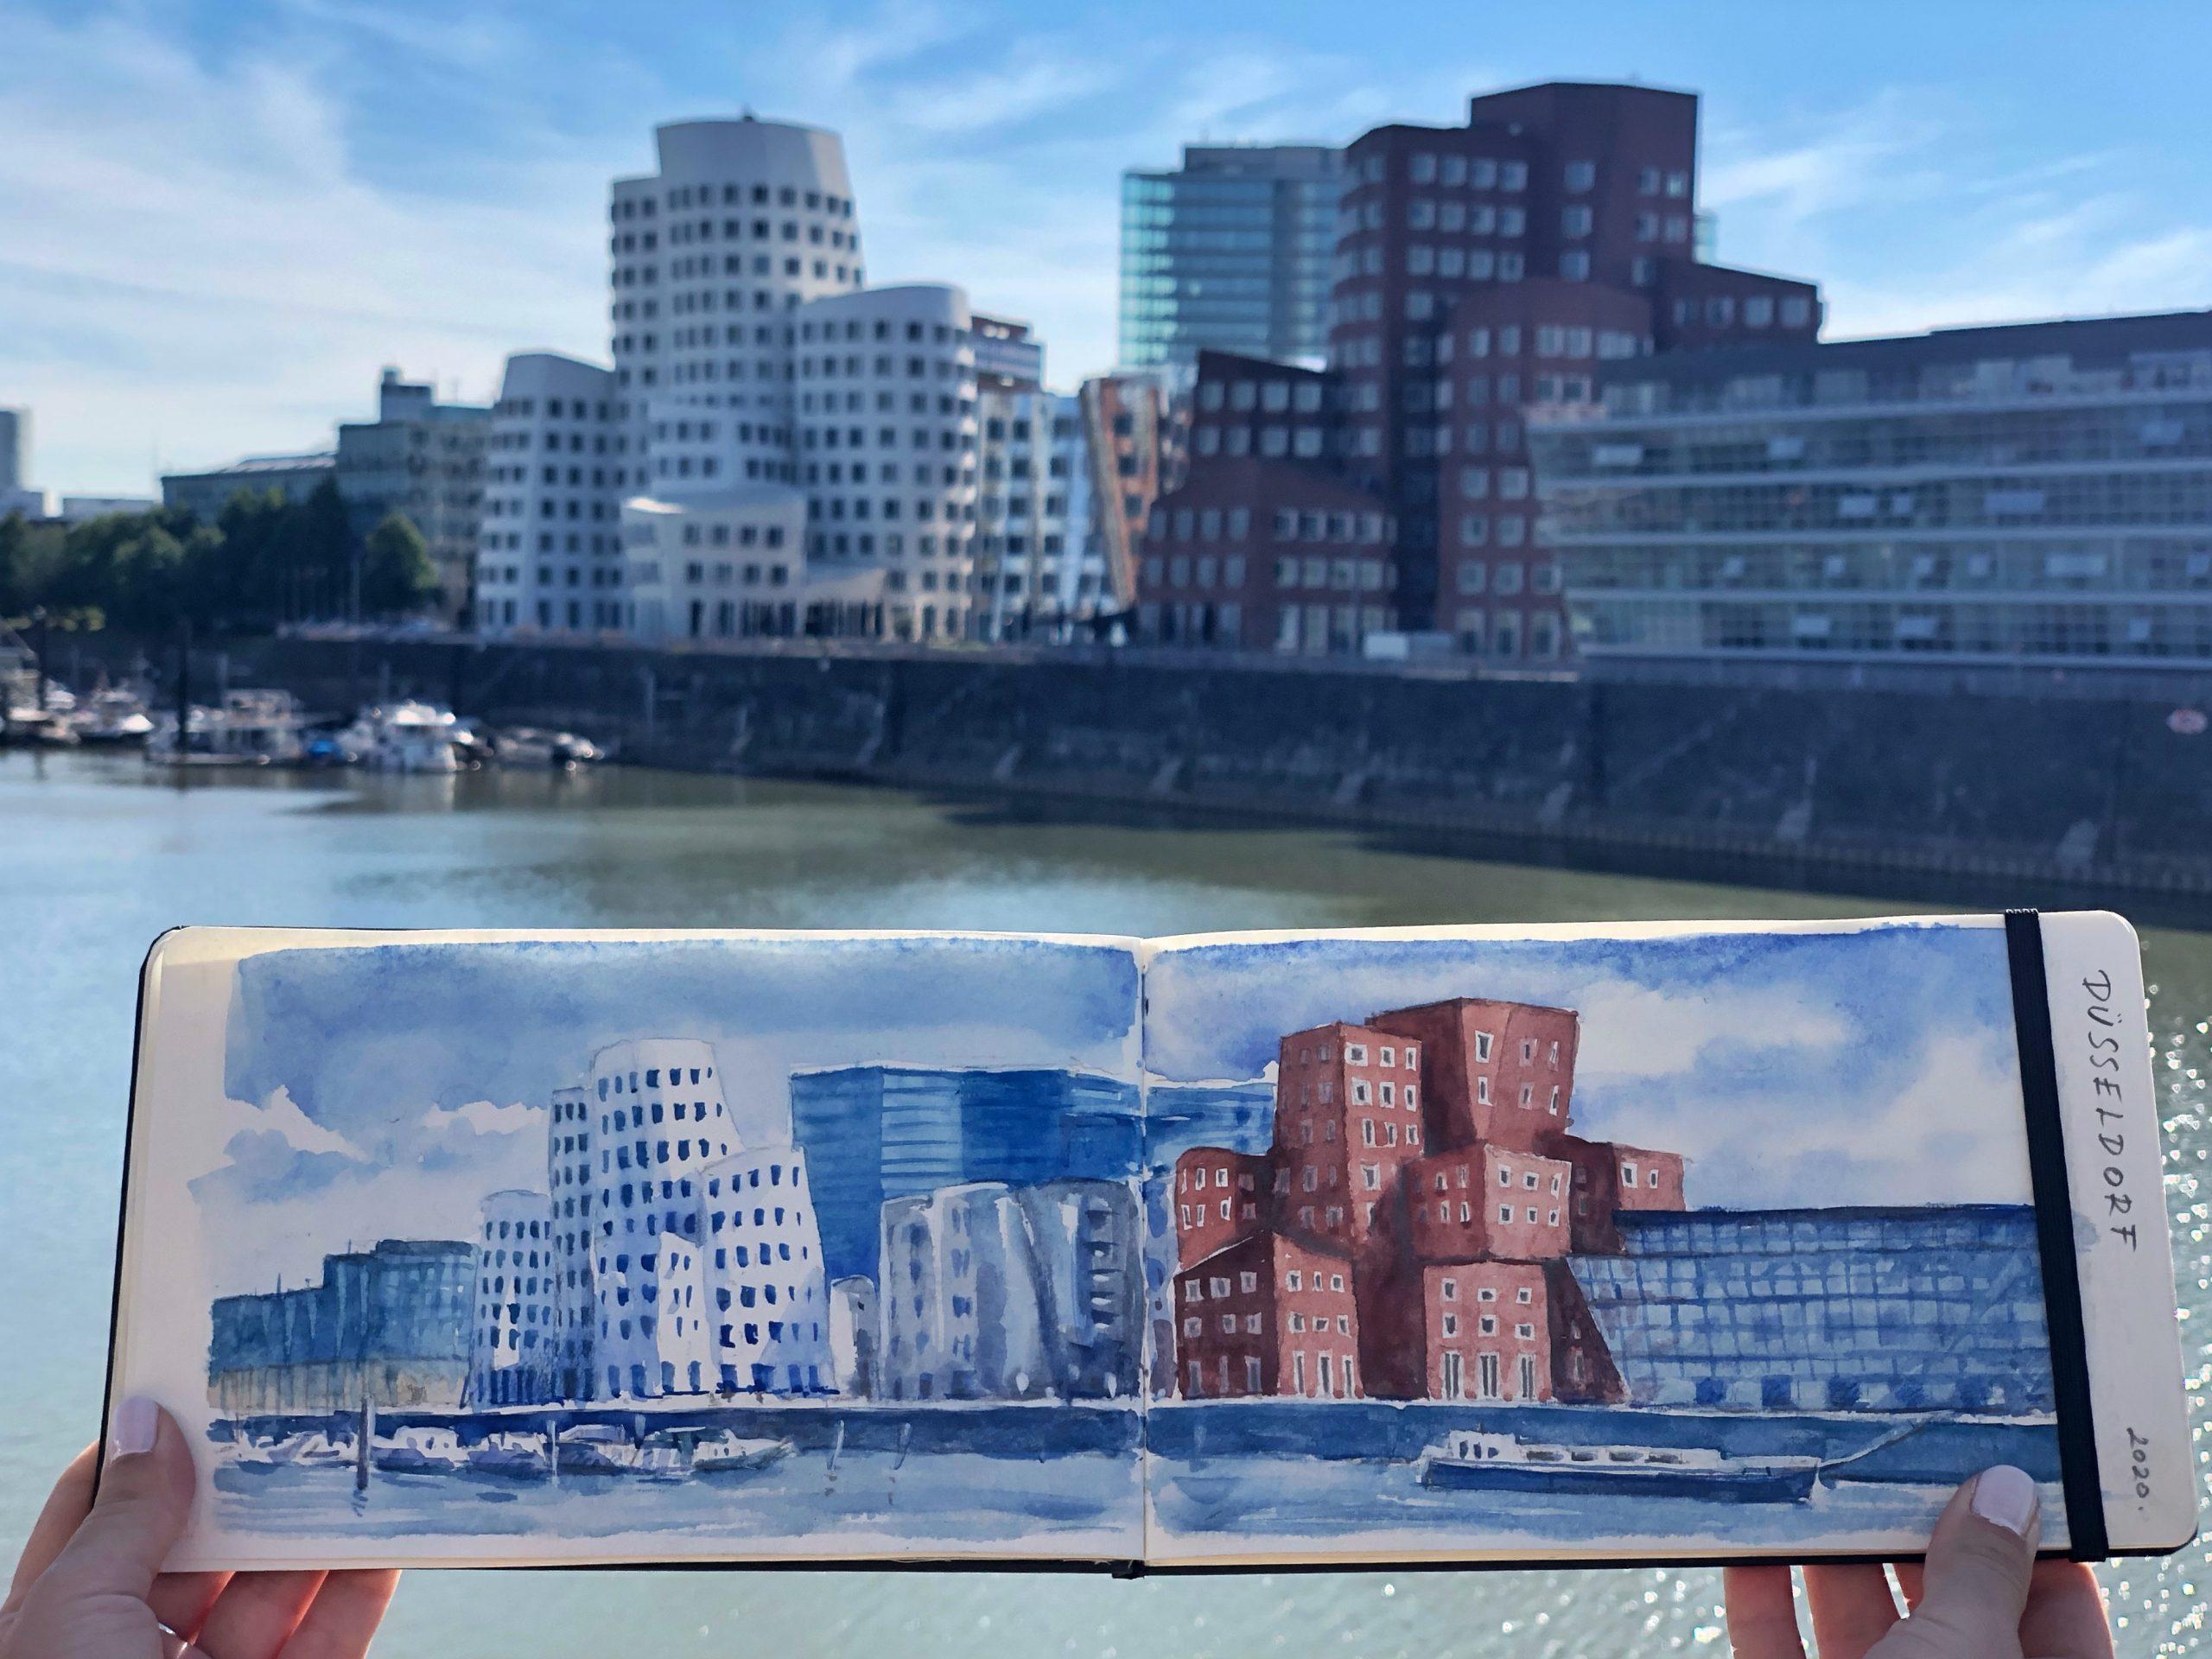 Düsseldorf Media Harbour